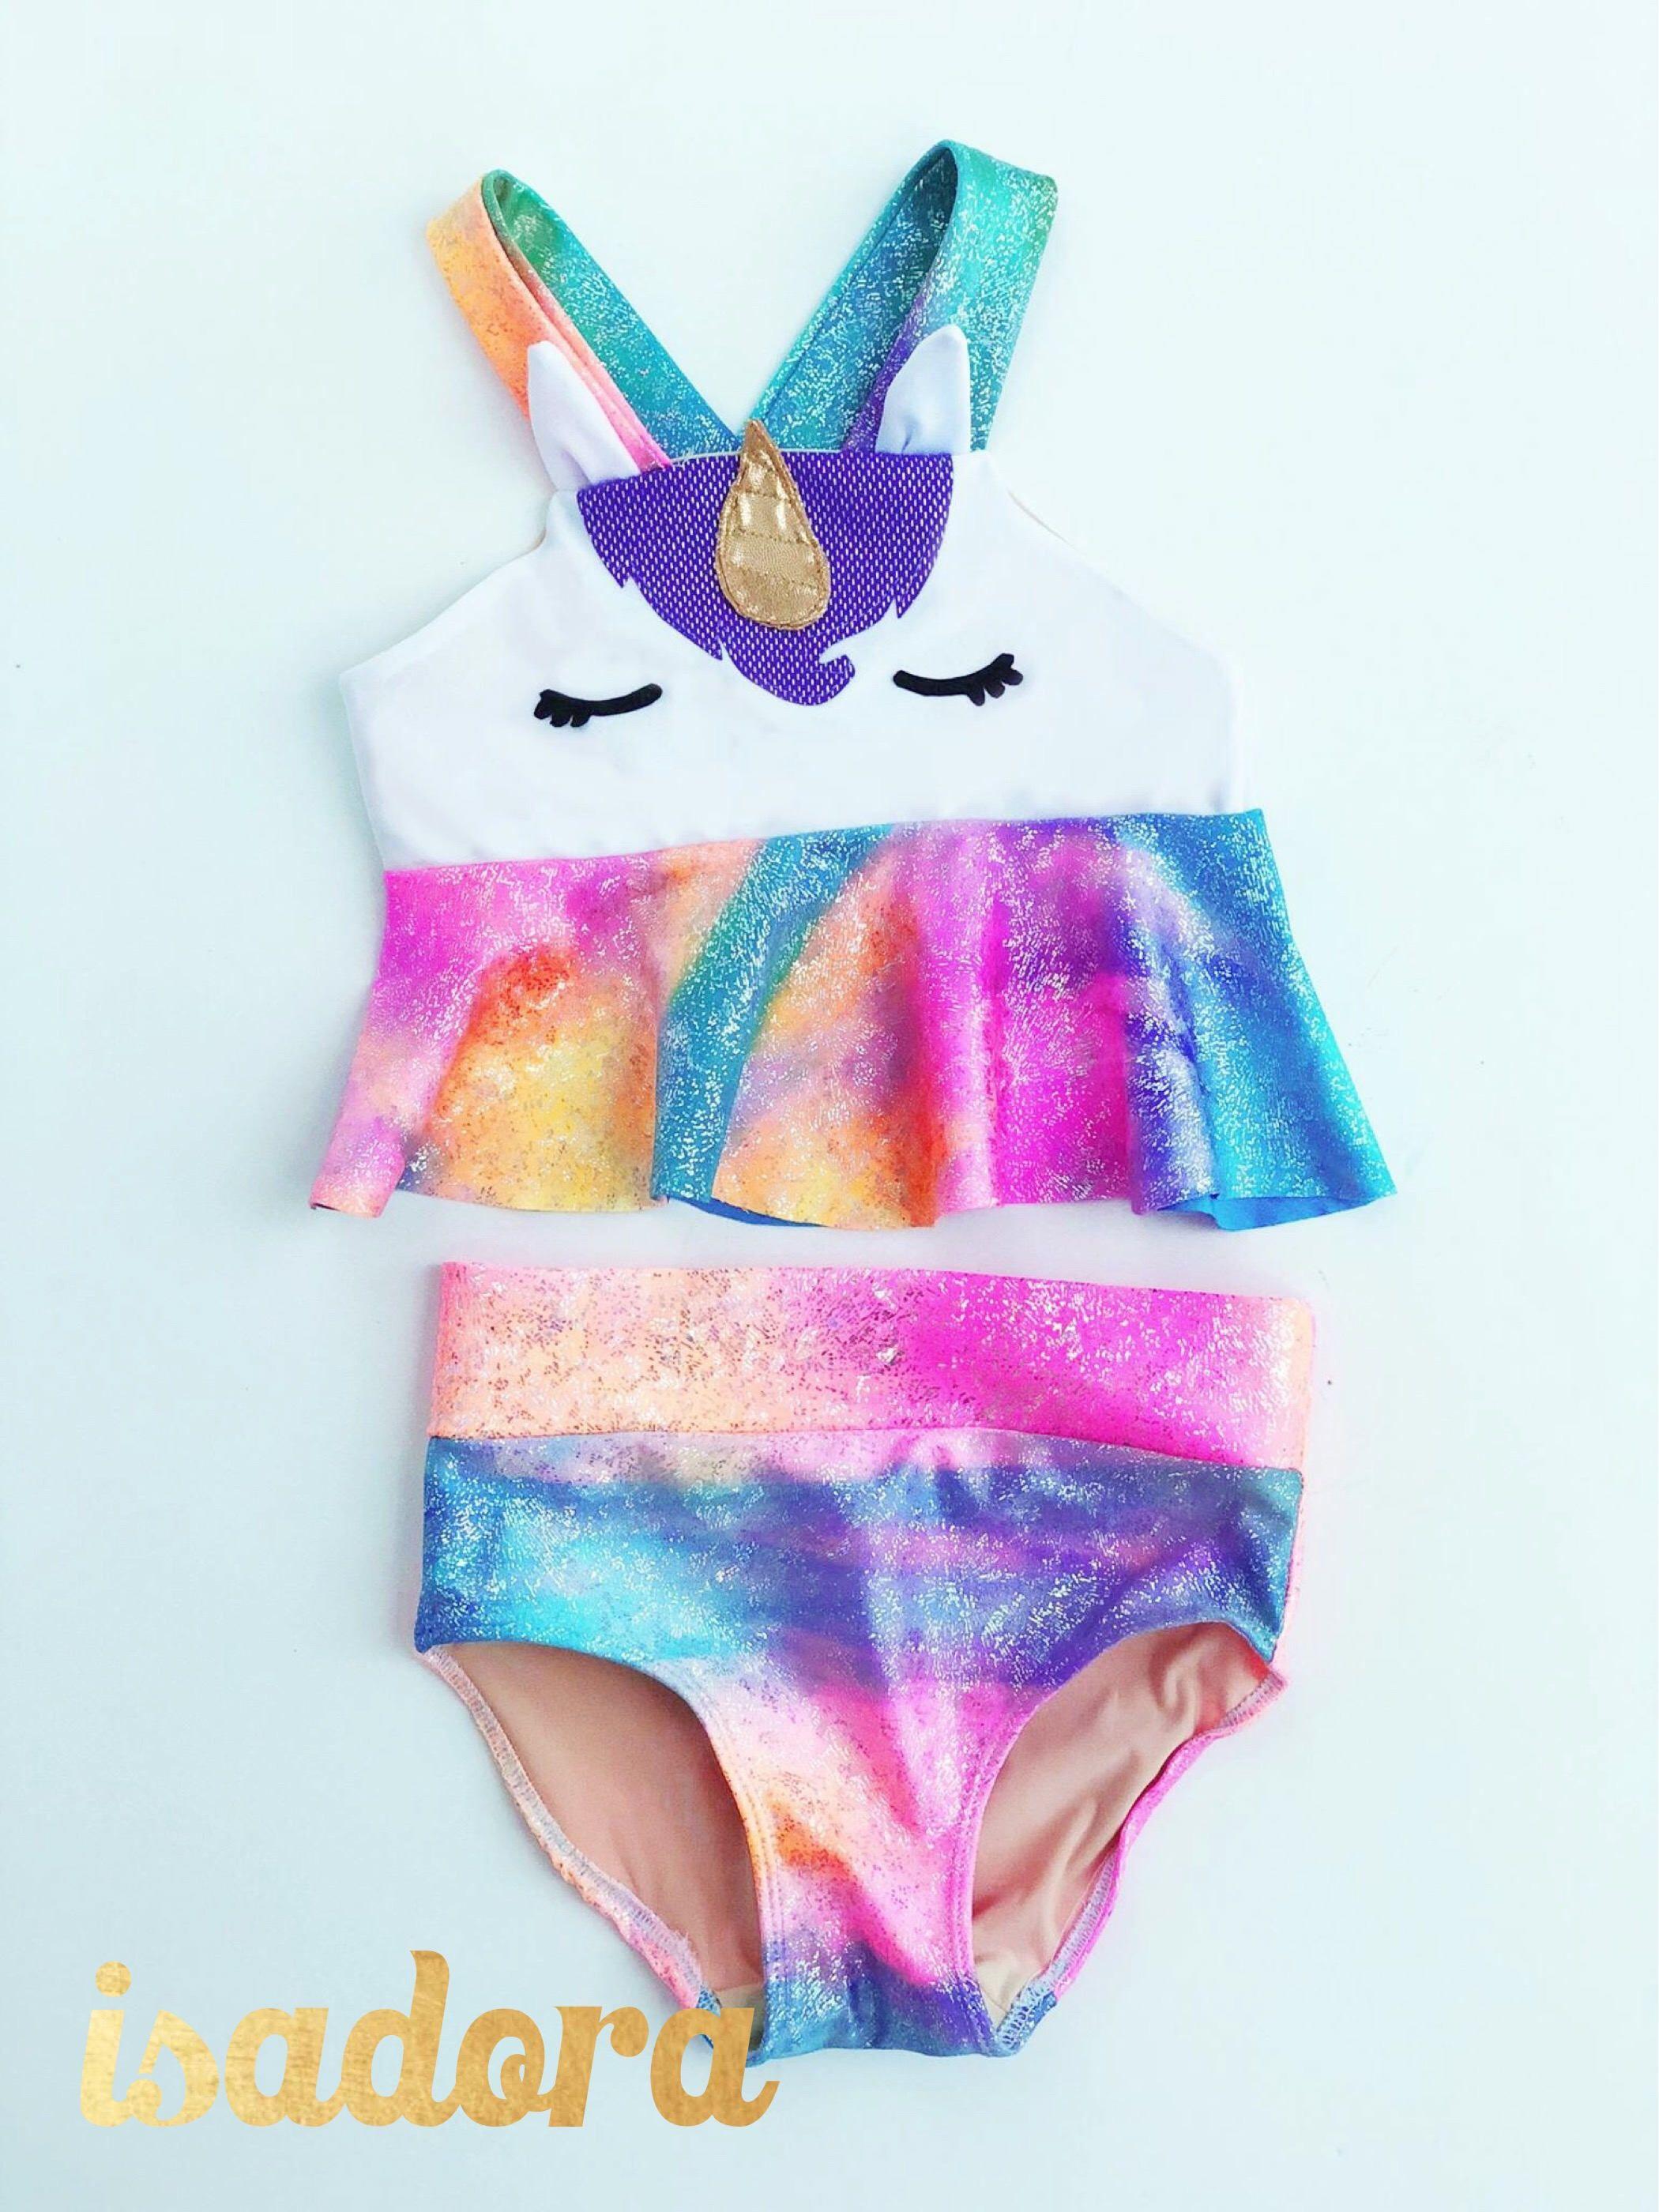 15dd0c65f20be Girls Delux Unicorn Swim Suit by ISADORAKIDS on Etsy https://www.etsy